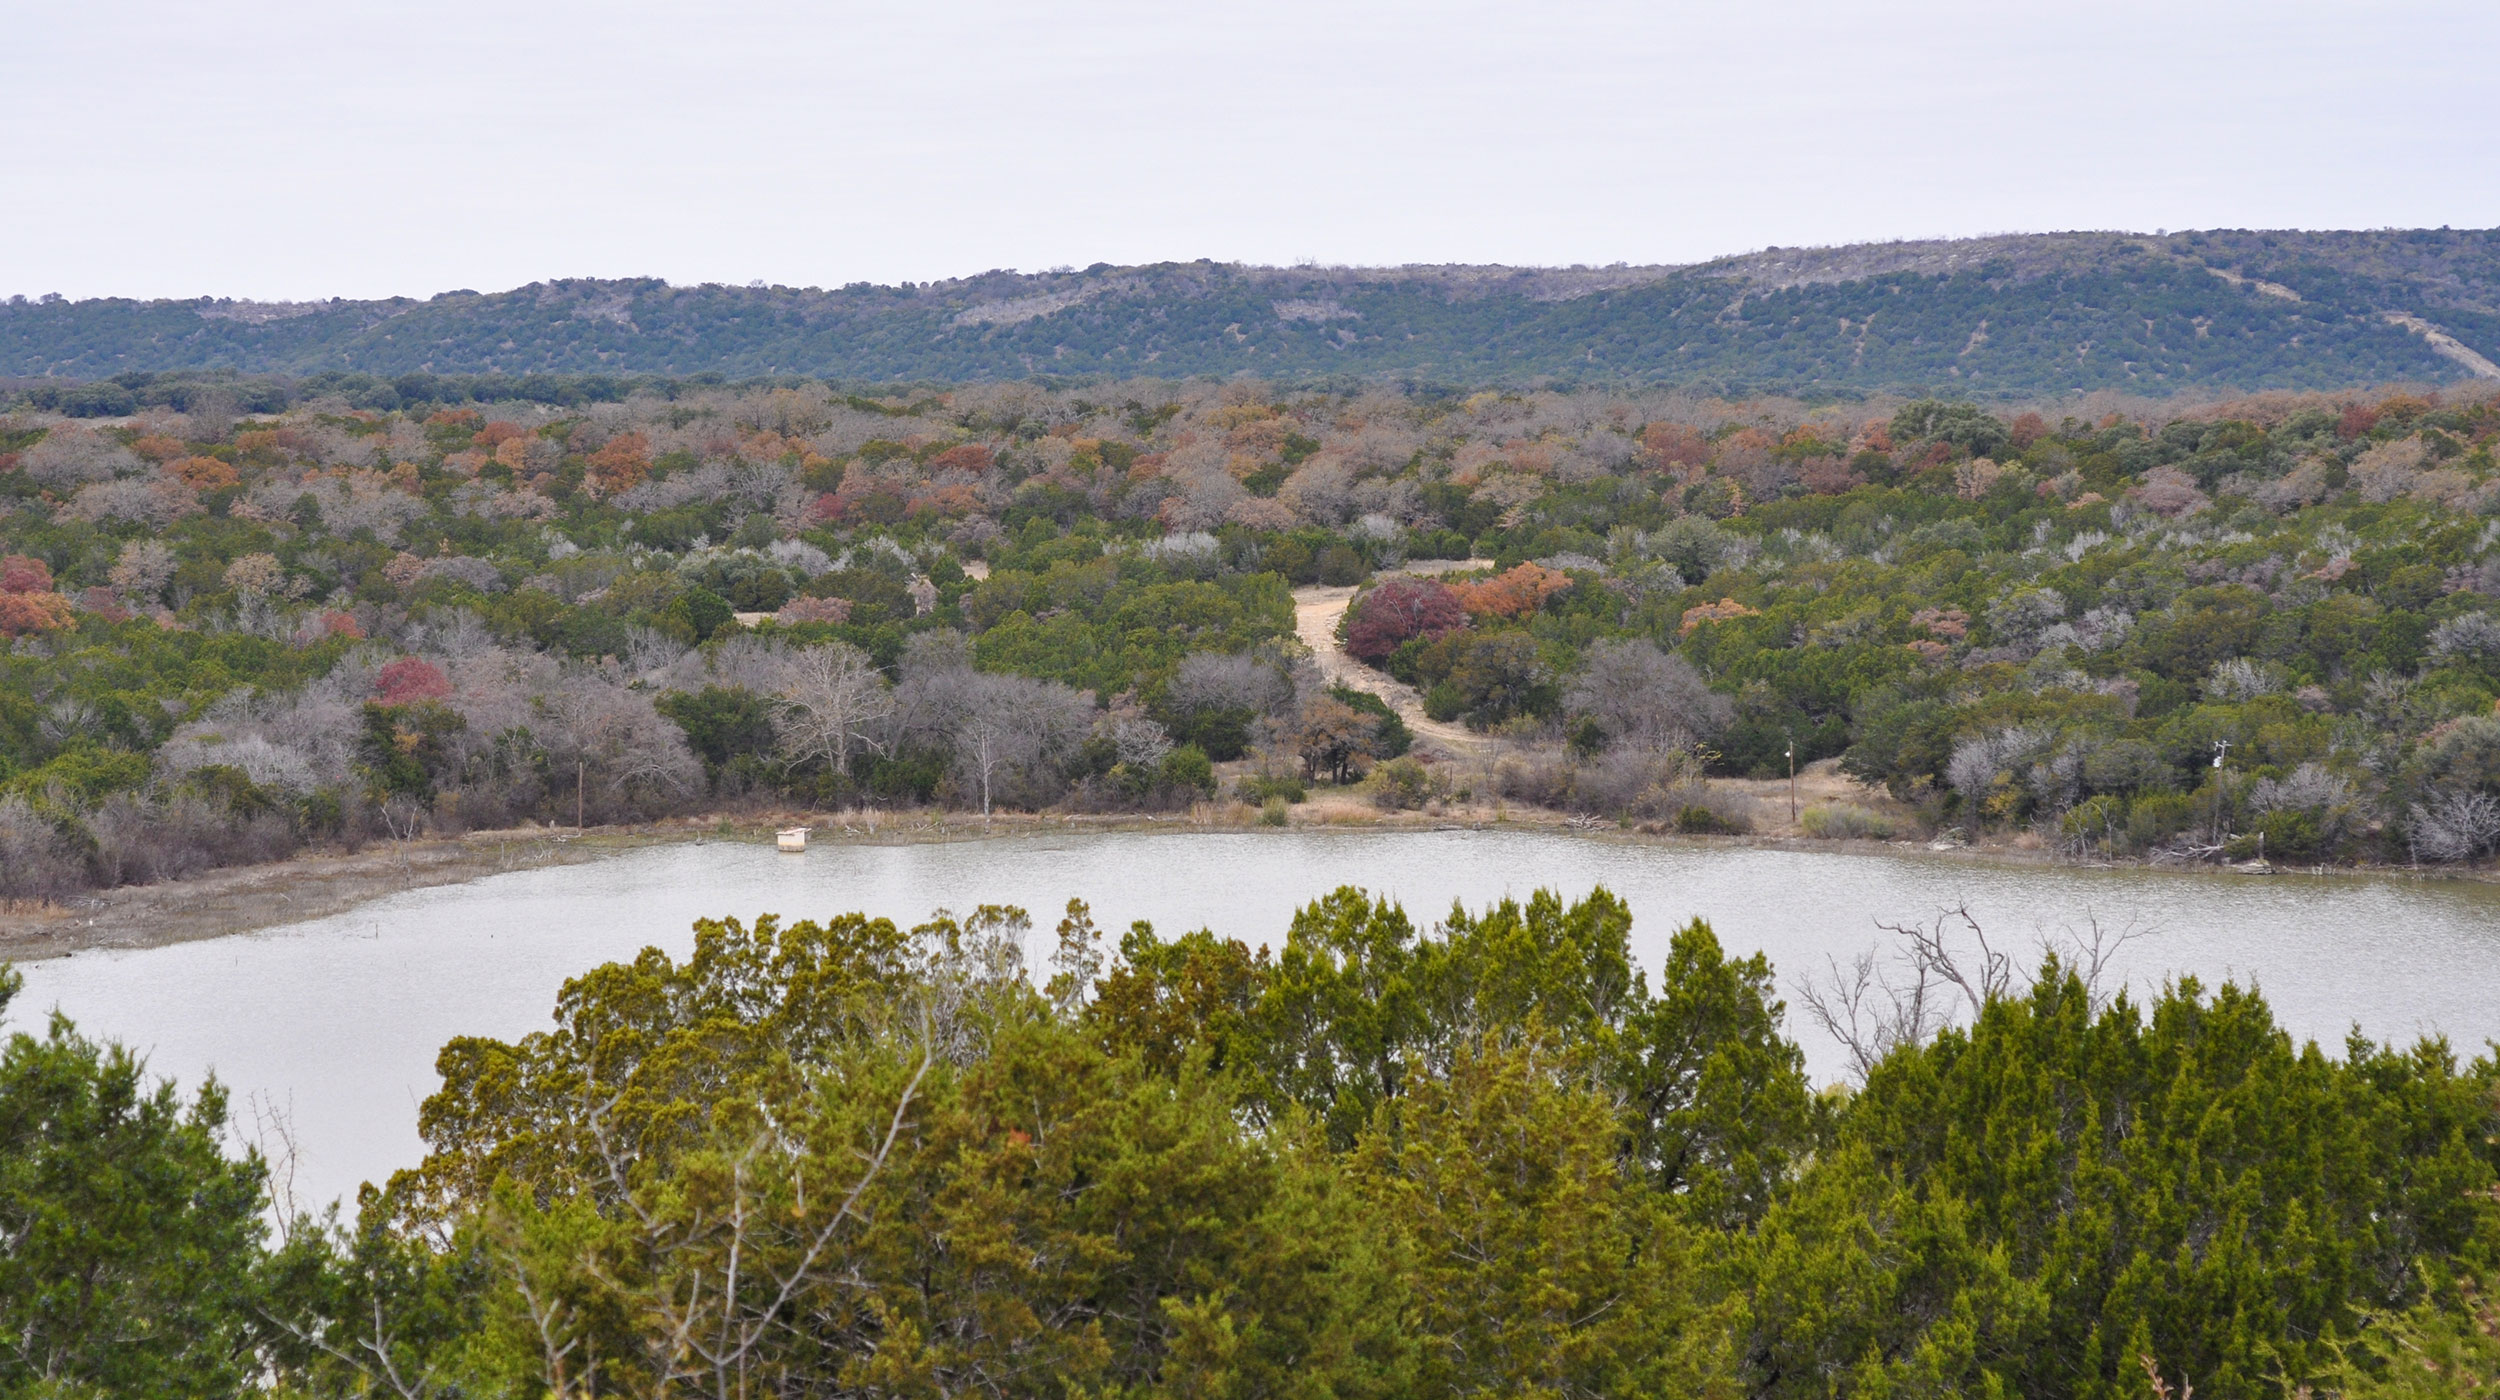 Palo Pinto State Park